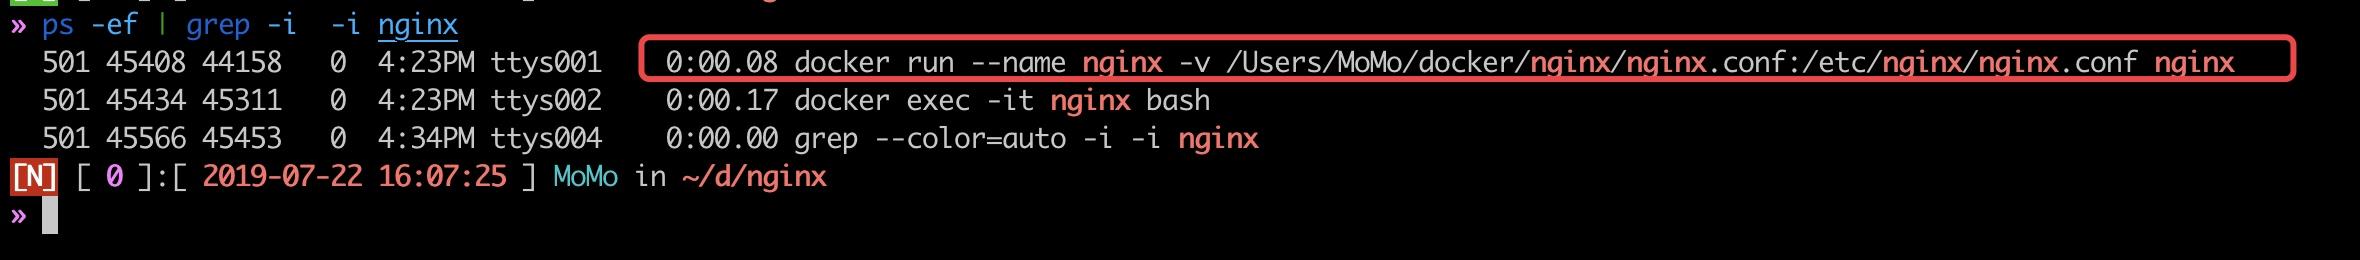 nginx-process-host